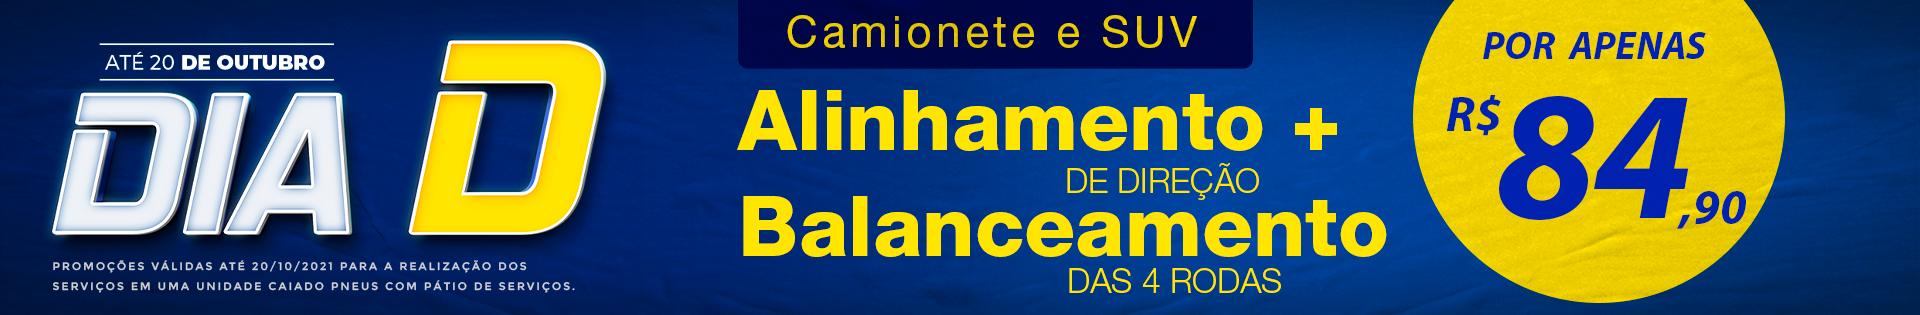 Banner-Combo-servicos-Suv